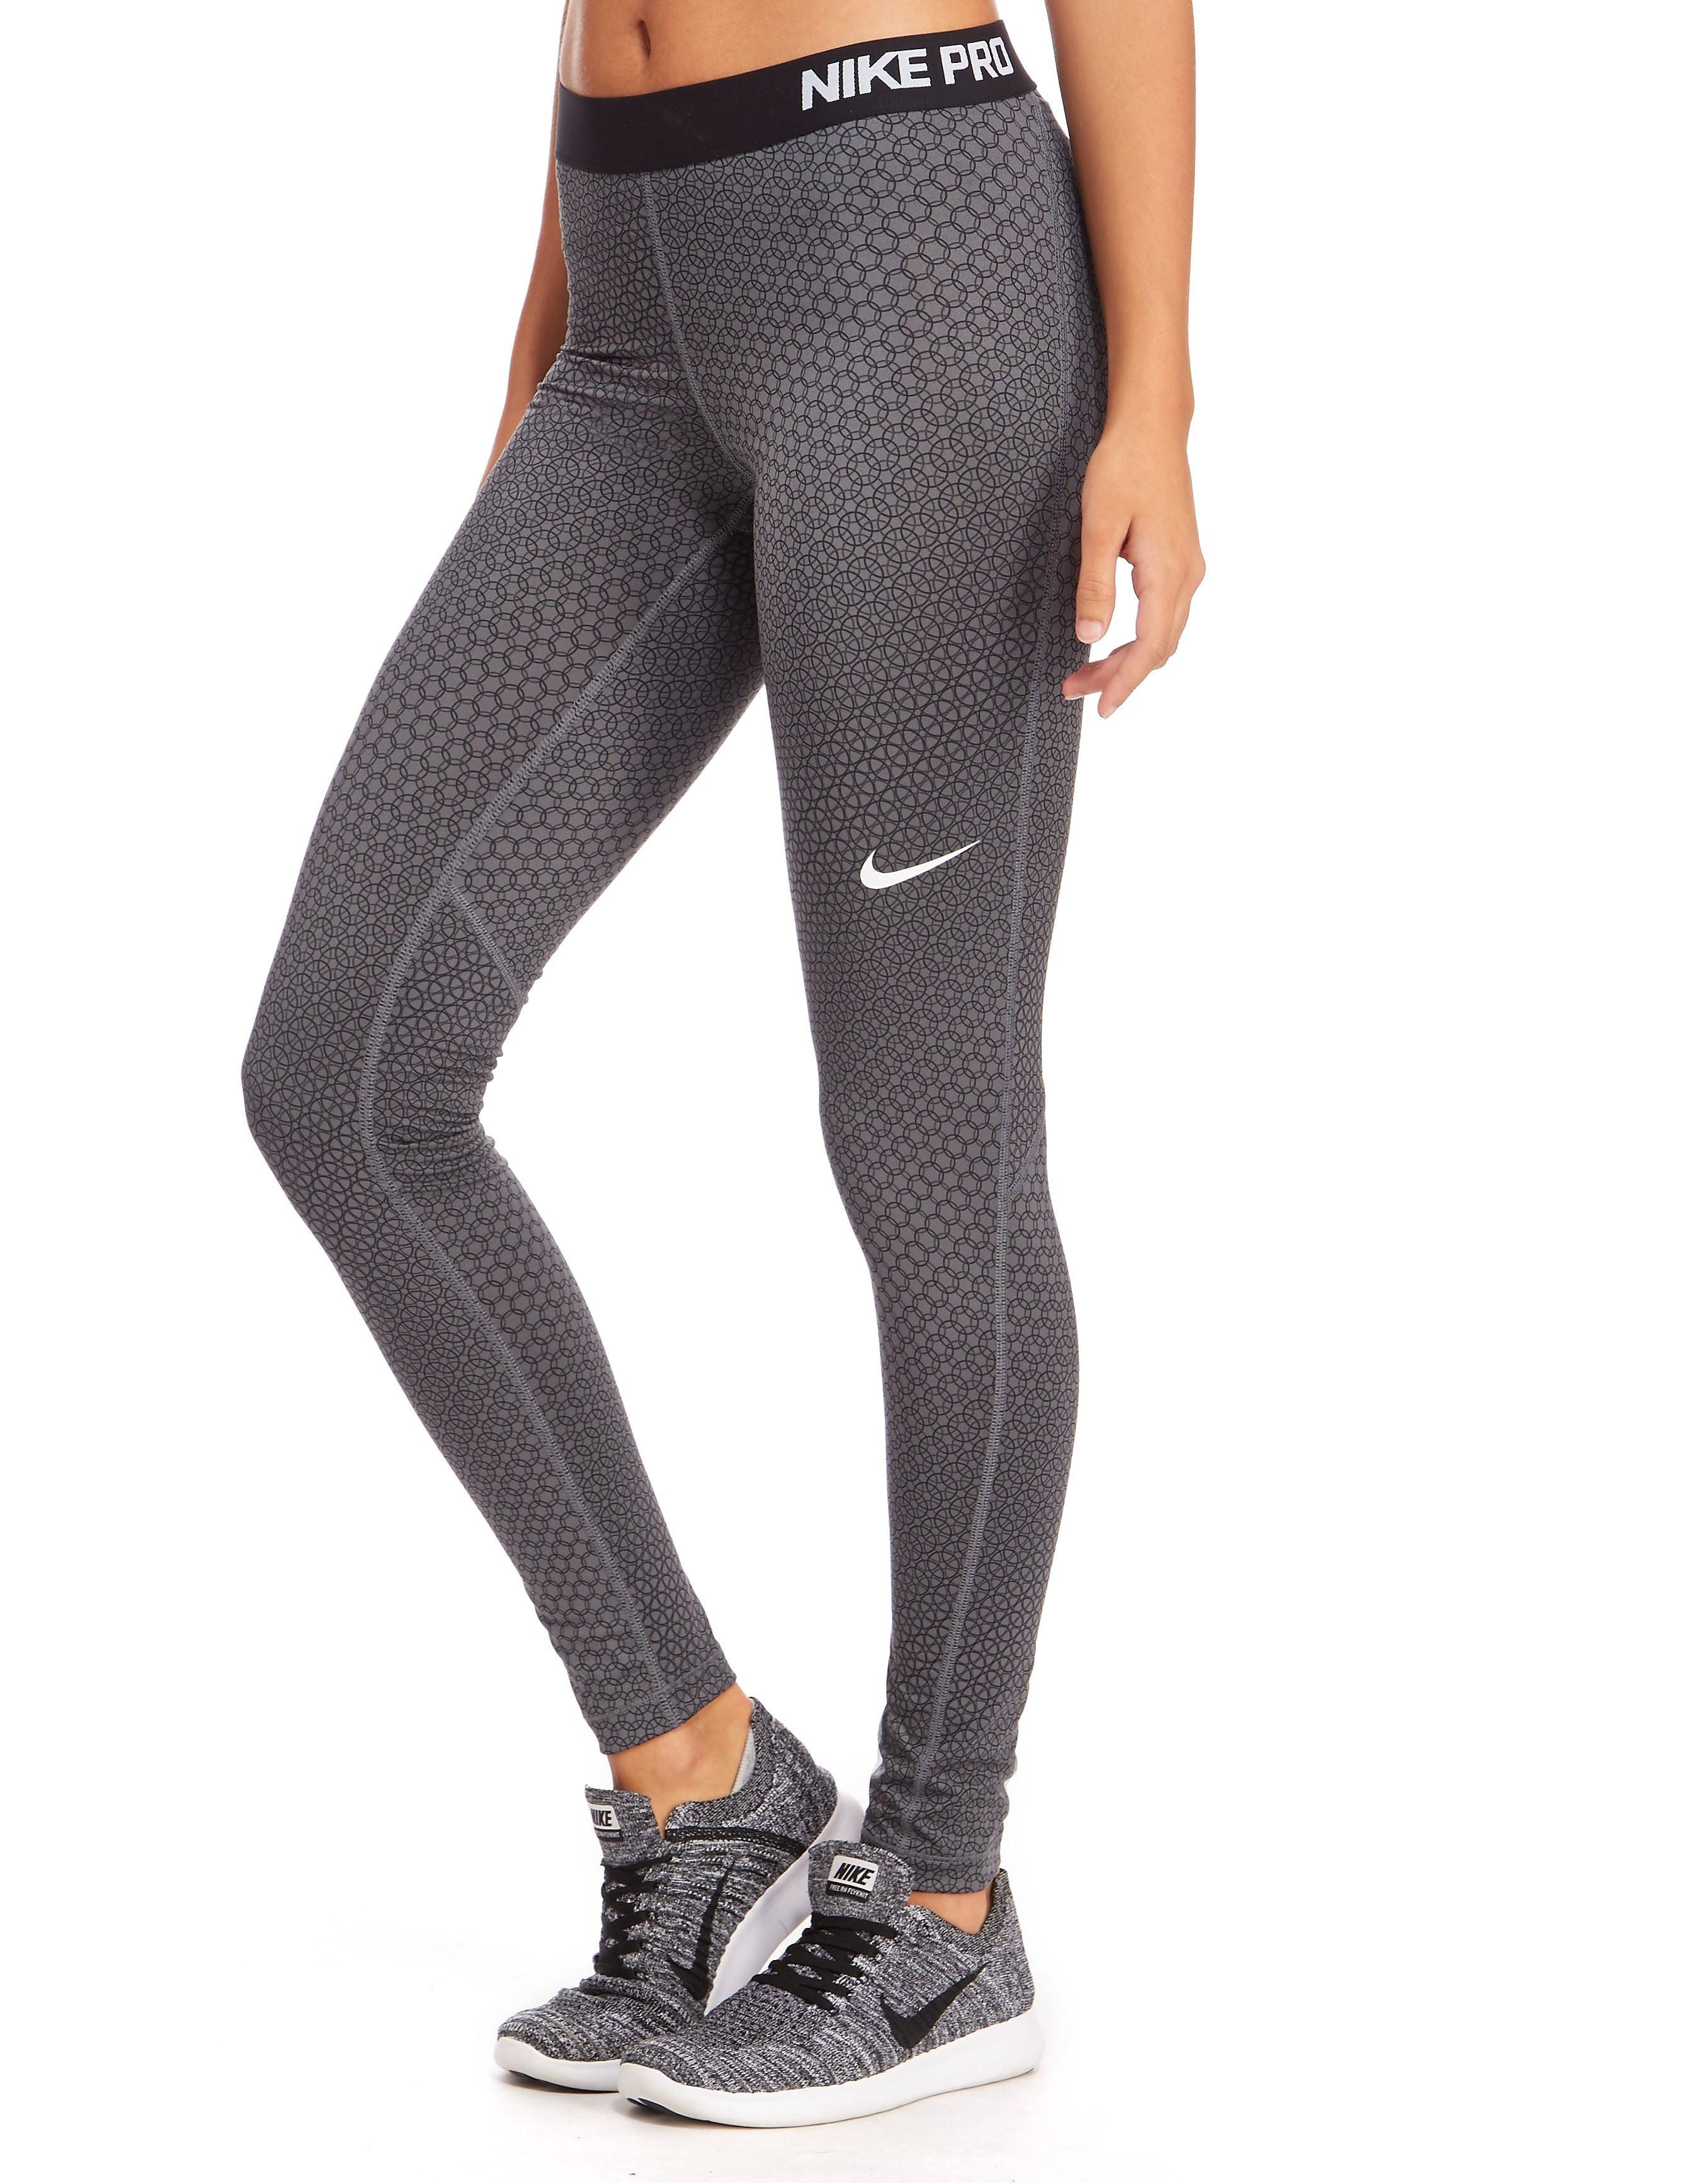 Nike Pro Print Tights